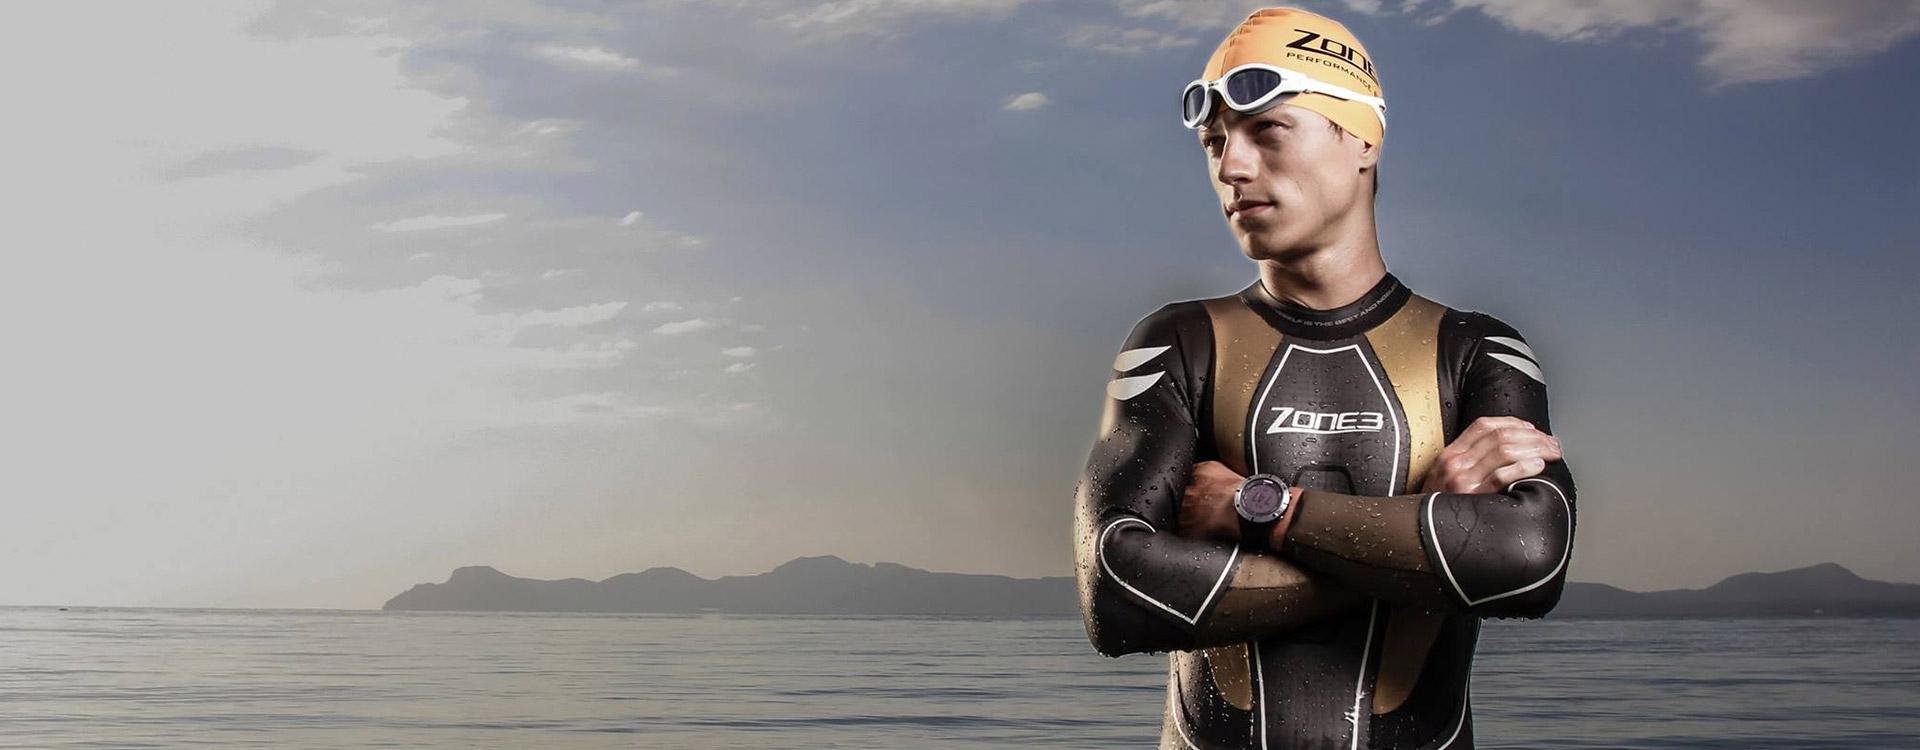 Men's-Victory-Wetsuit---Header.jpg-2